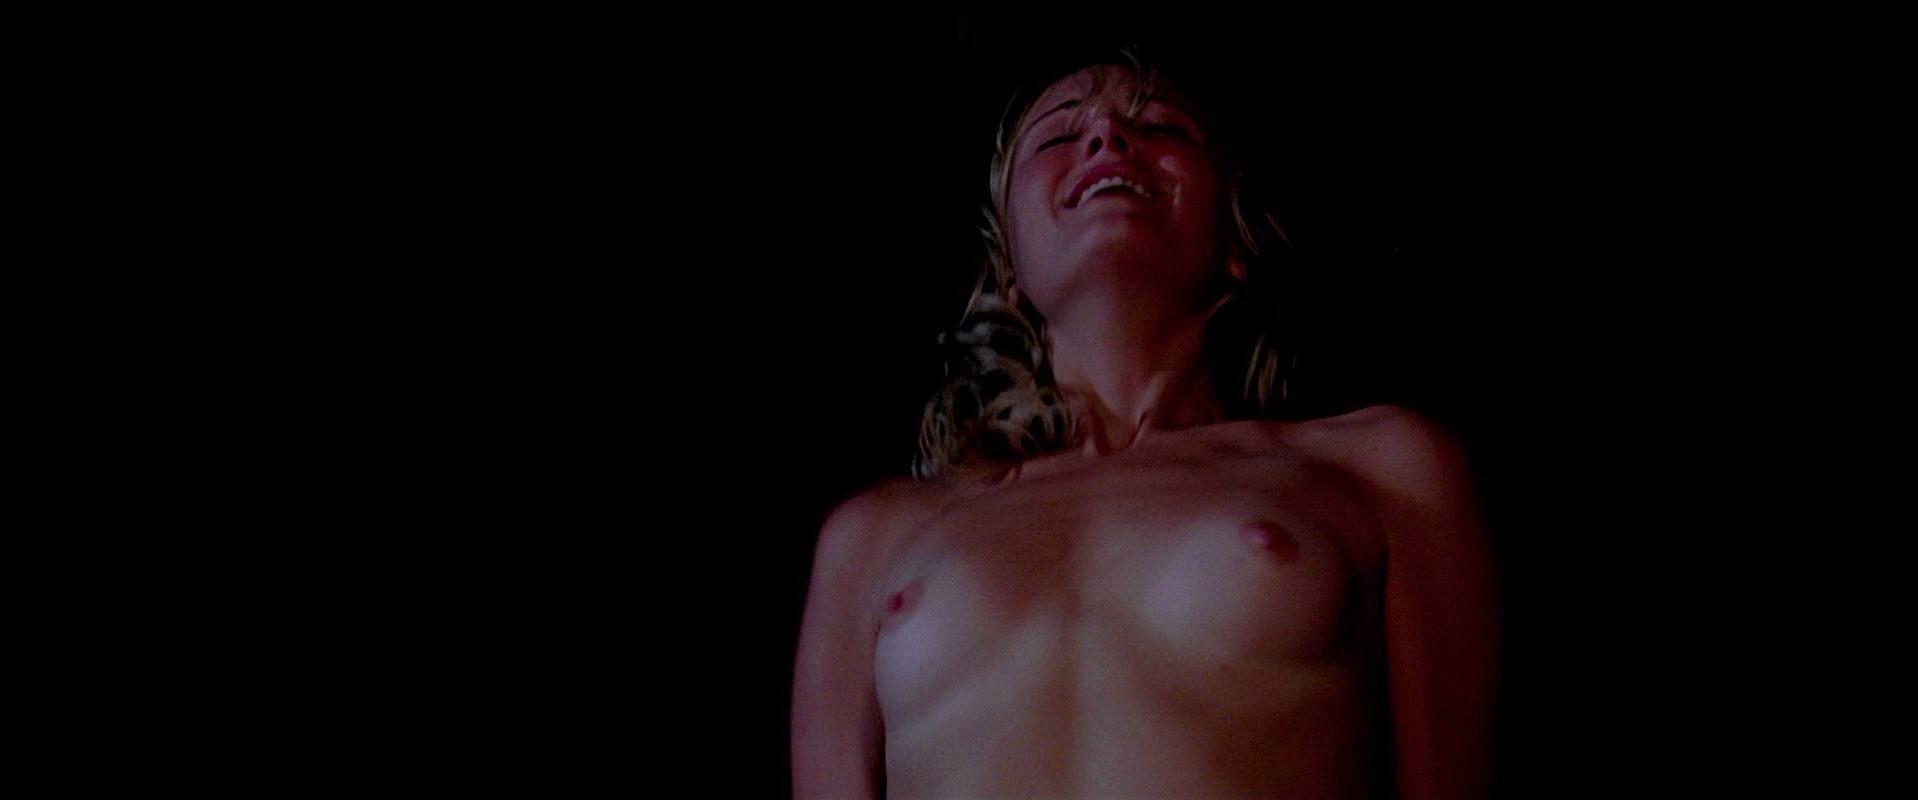 Nude Video Celebs  Malin Akerman Nude - The Heartbreak -6205